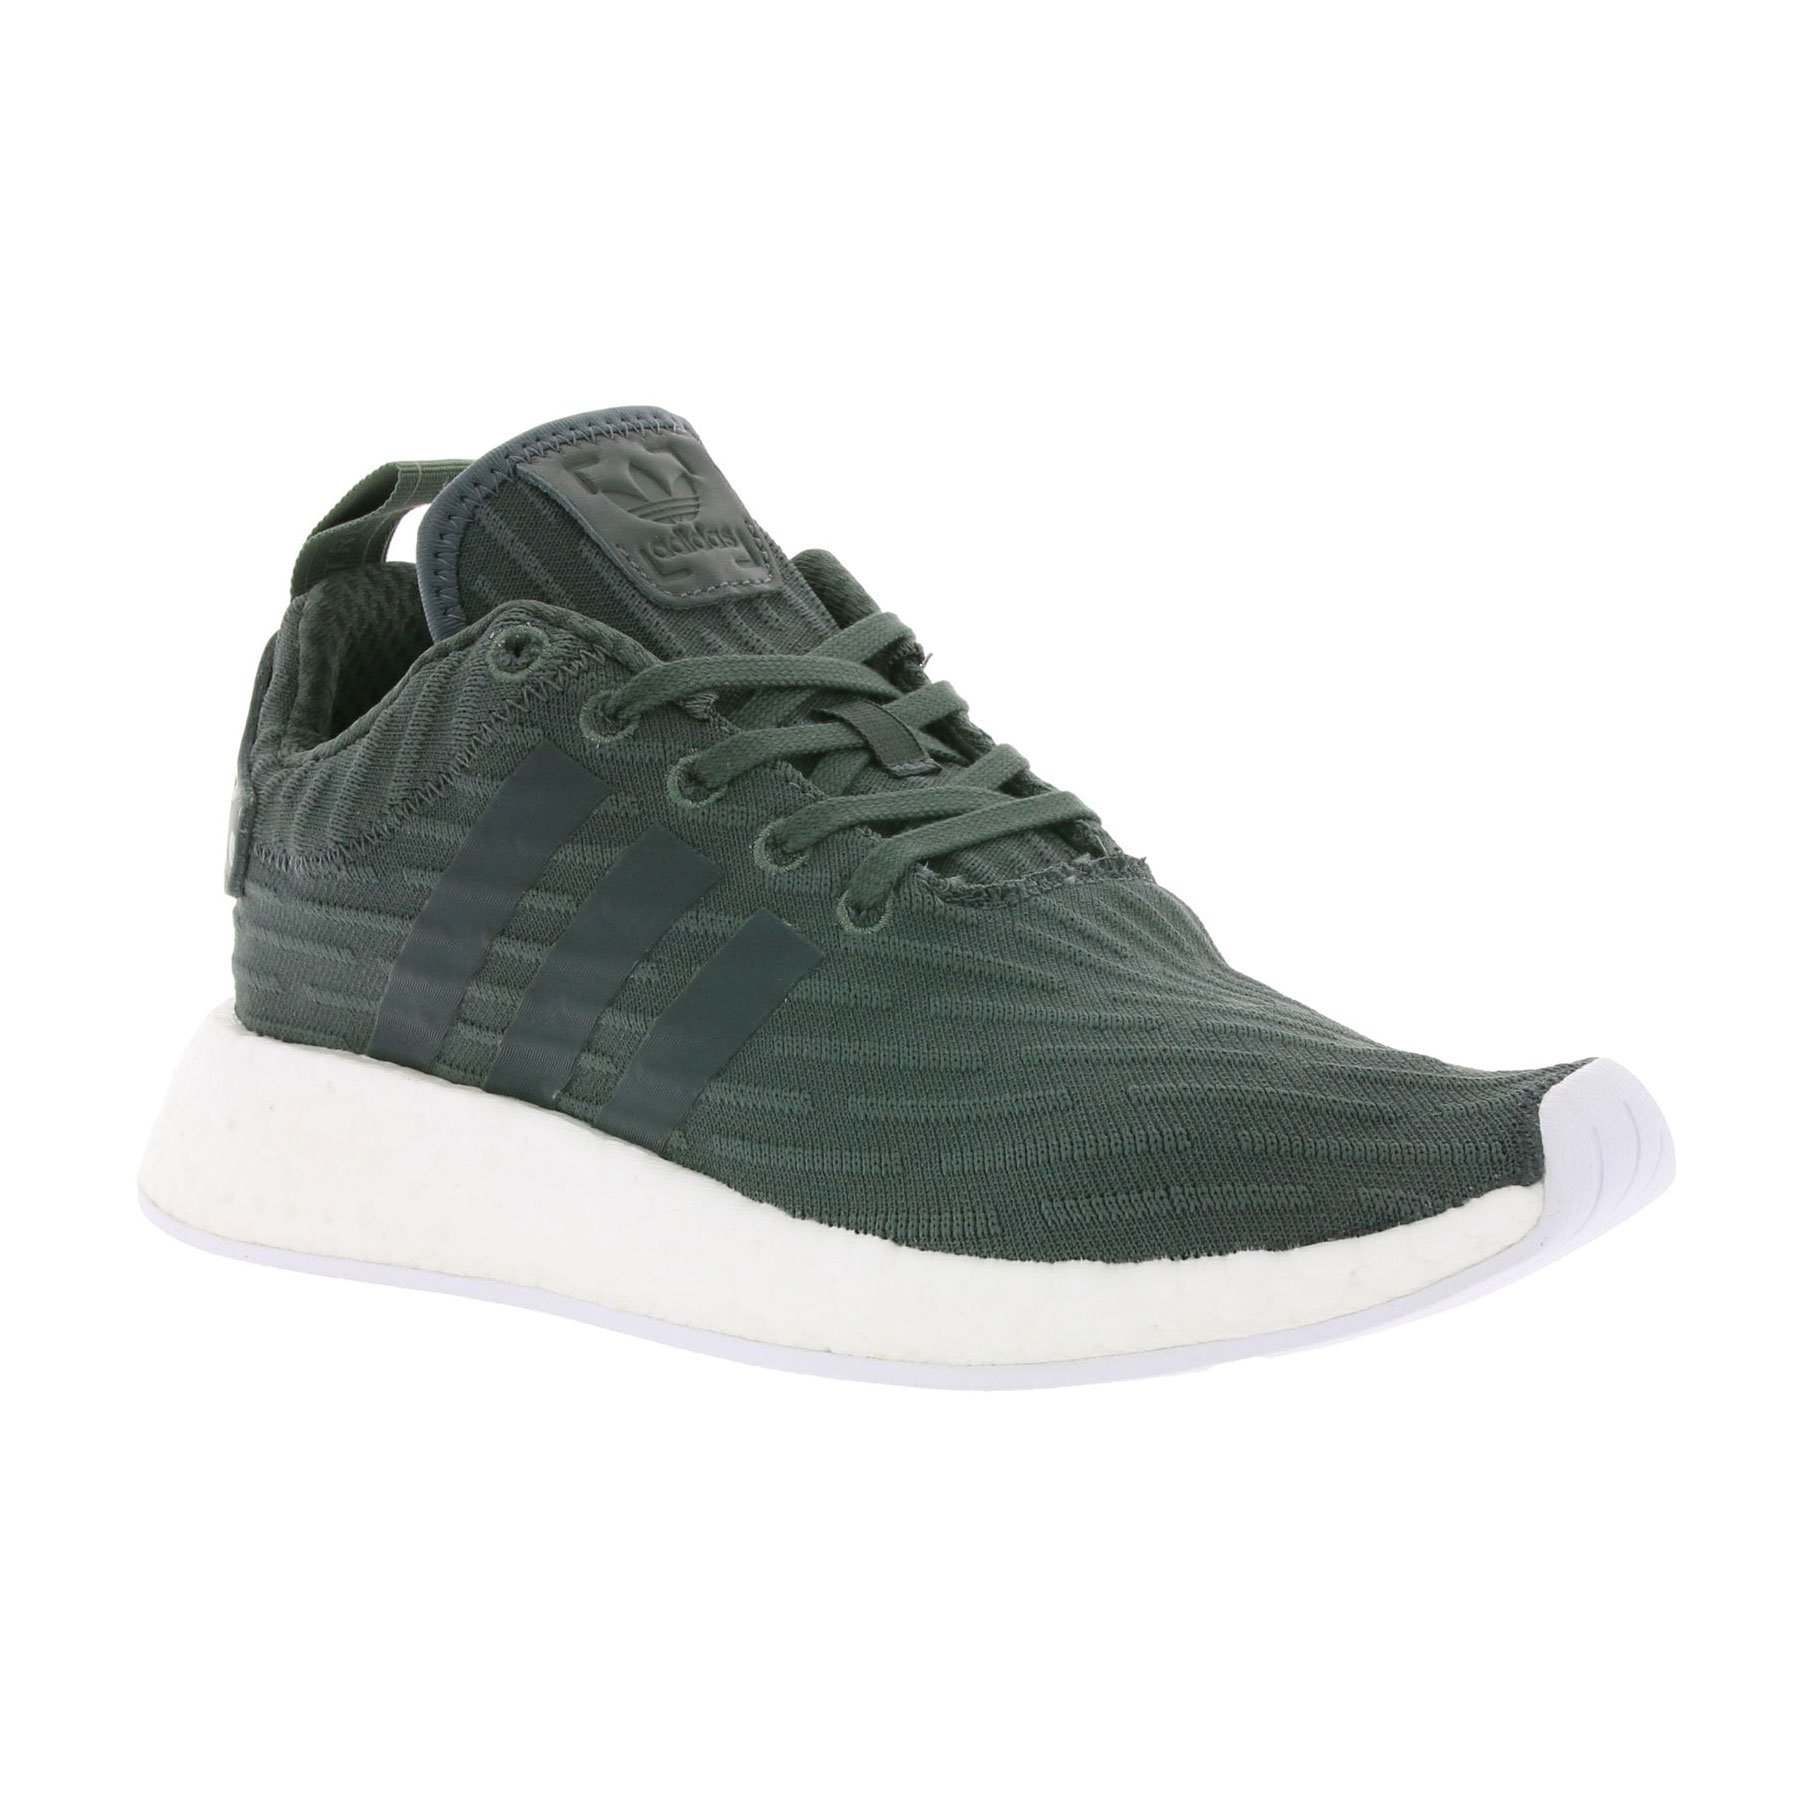 9 Ba7261 dimensioni Adidas R2 Nmd nbsp;olive nbsp; vpqvYBAw